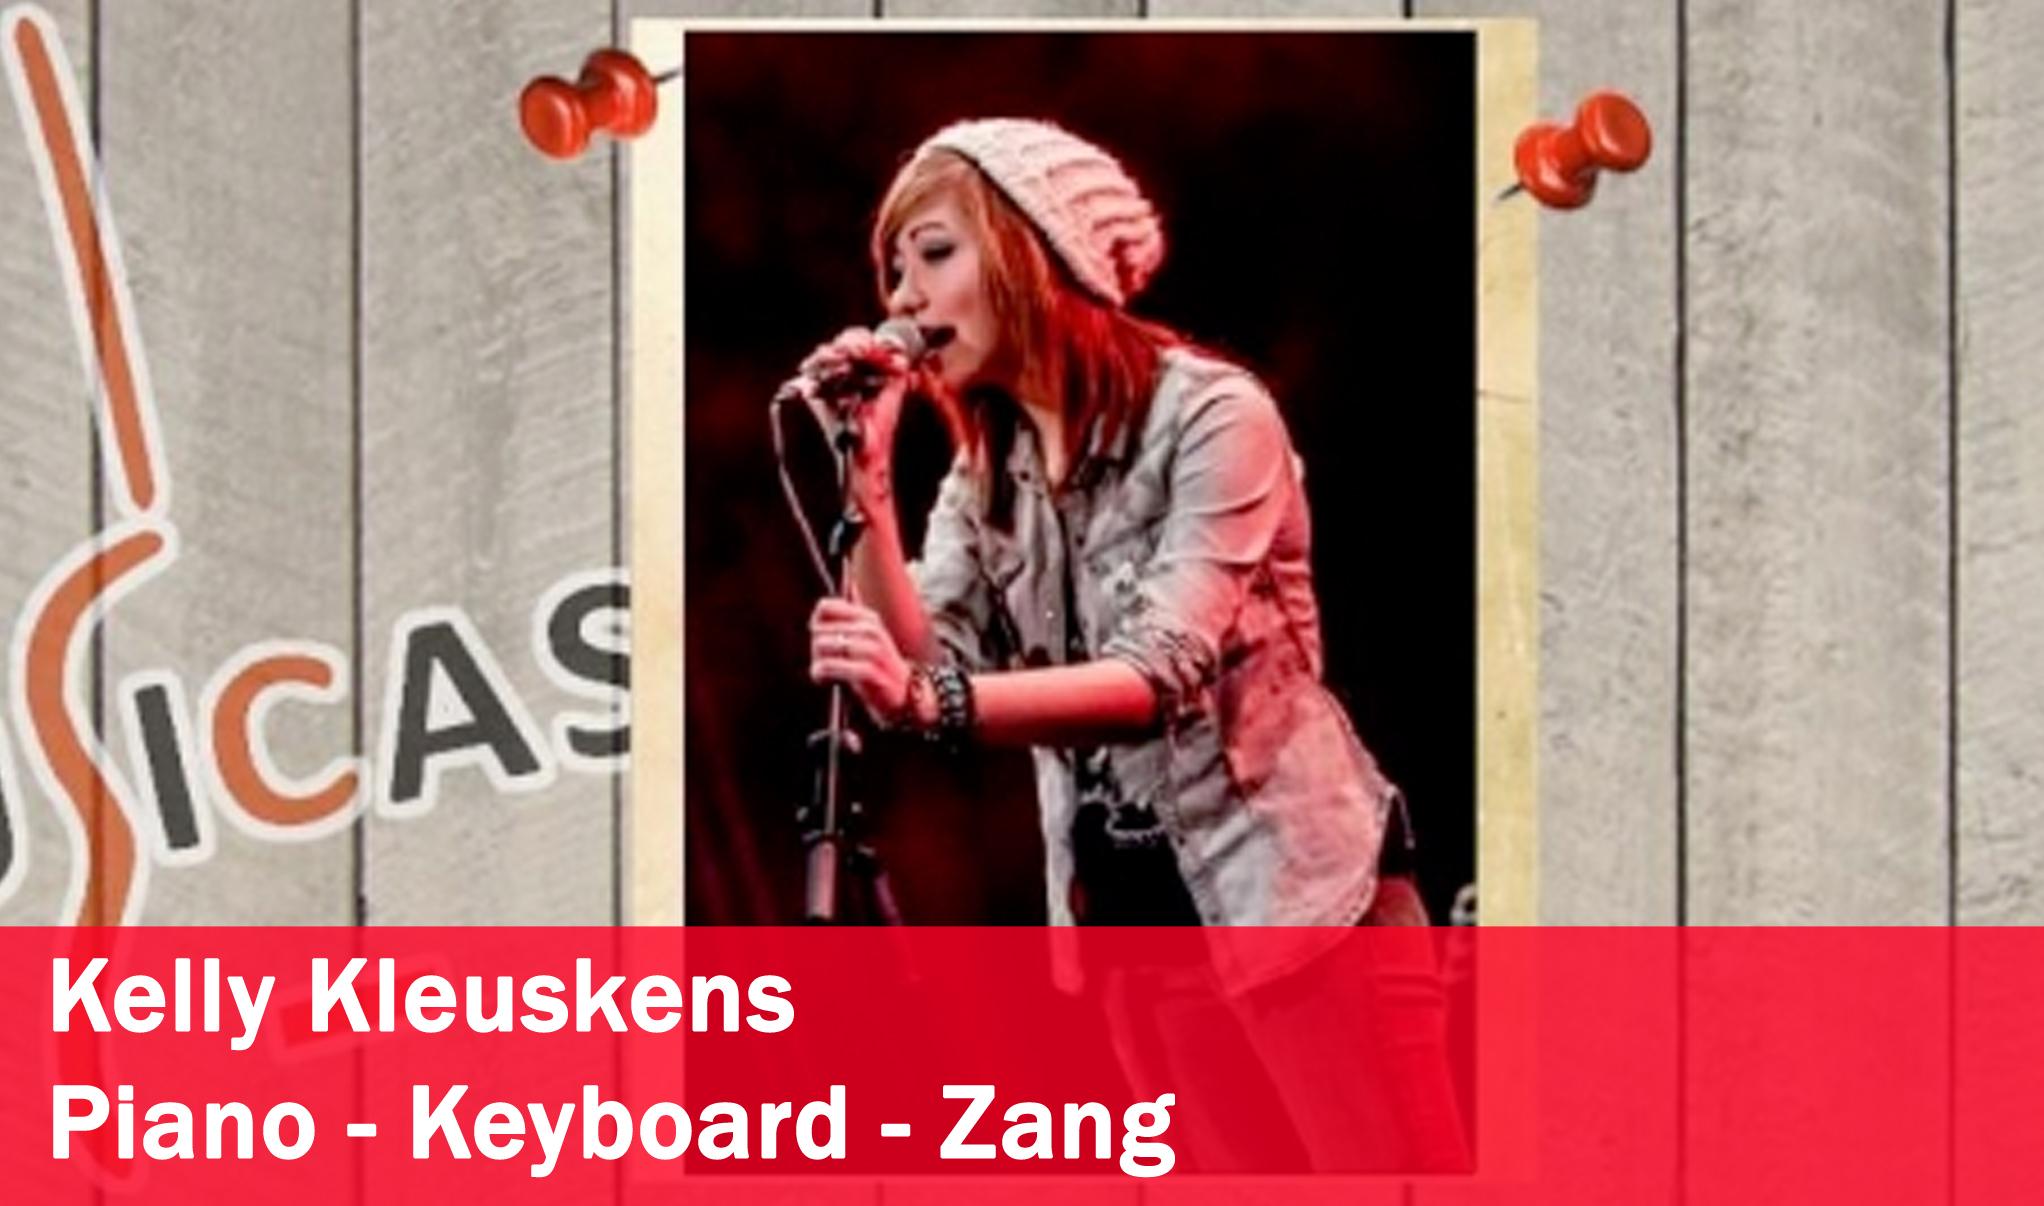 Kelly Kleuskens <br>Piano - Keyboard - Zang